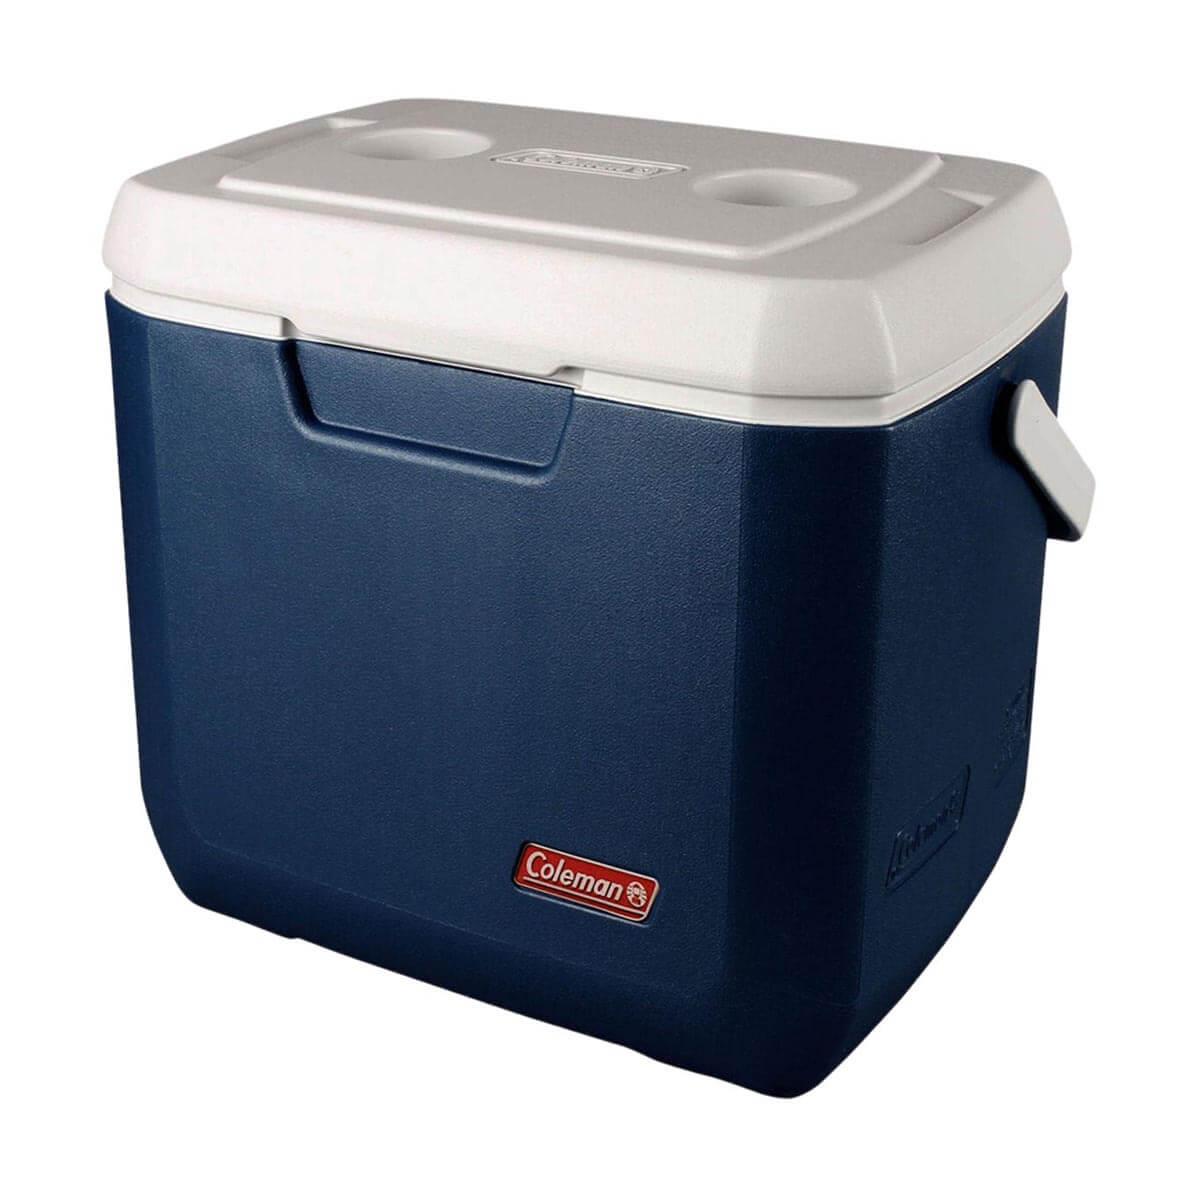 Coleman 28-Quart Performance Cooler